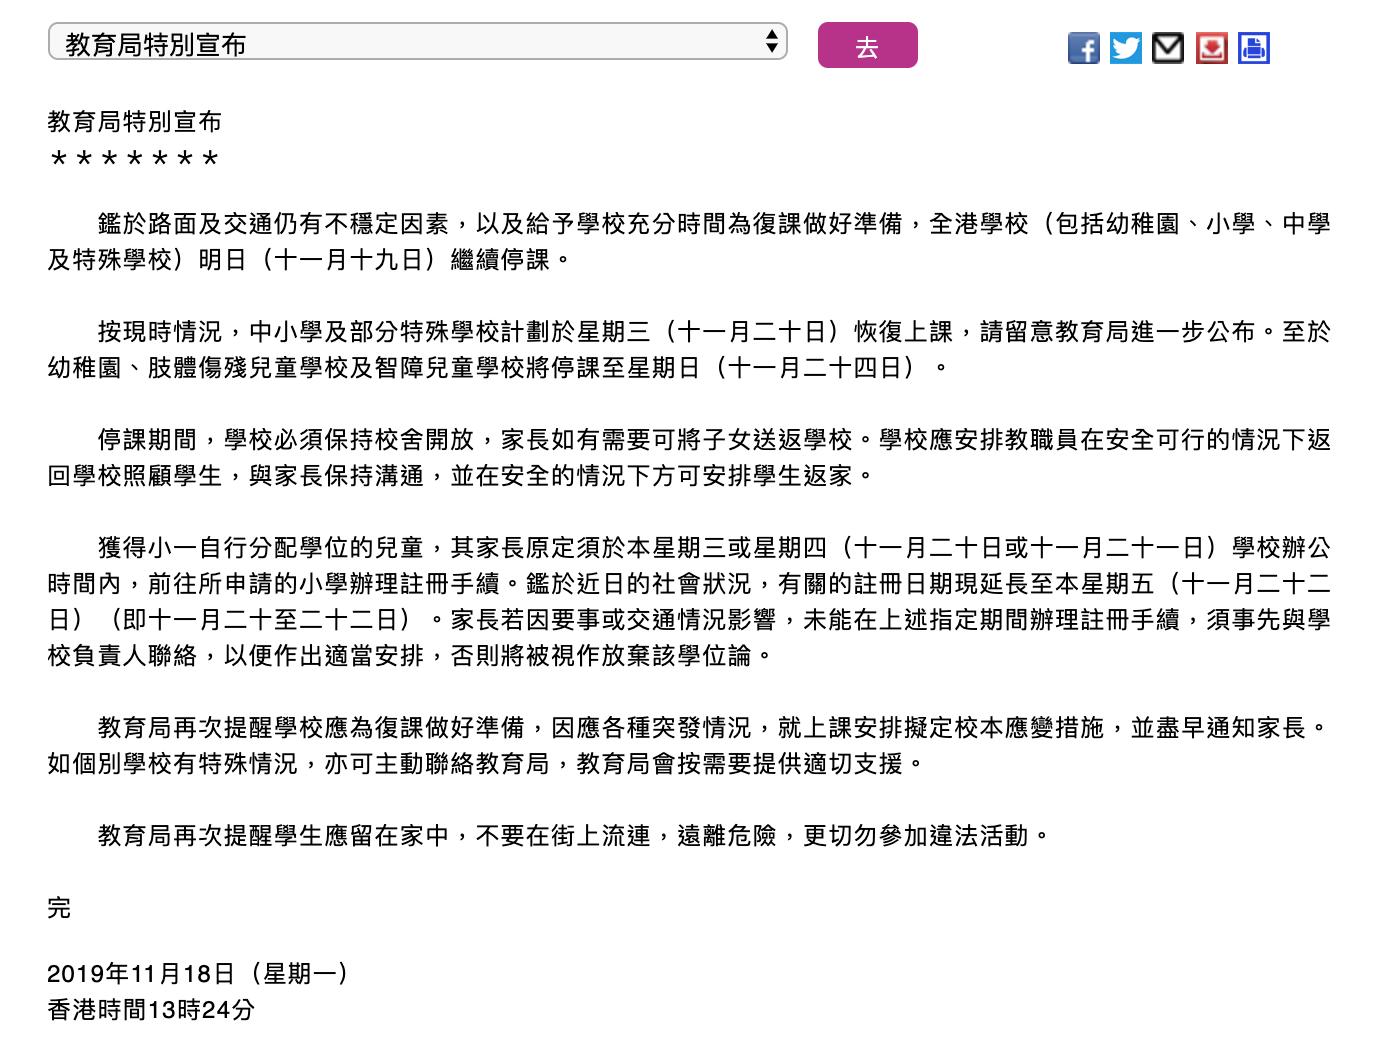 Photo of 18/11(13:25)教育局特別宣布Special announcement by Education Bureau